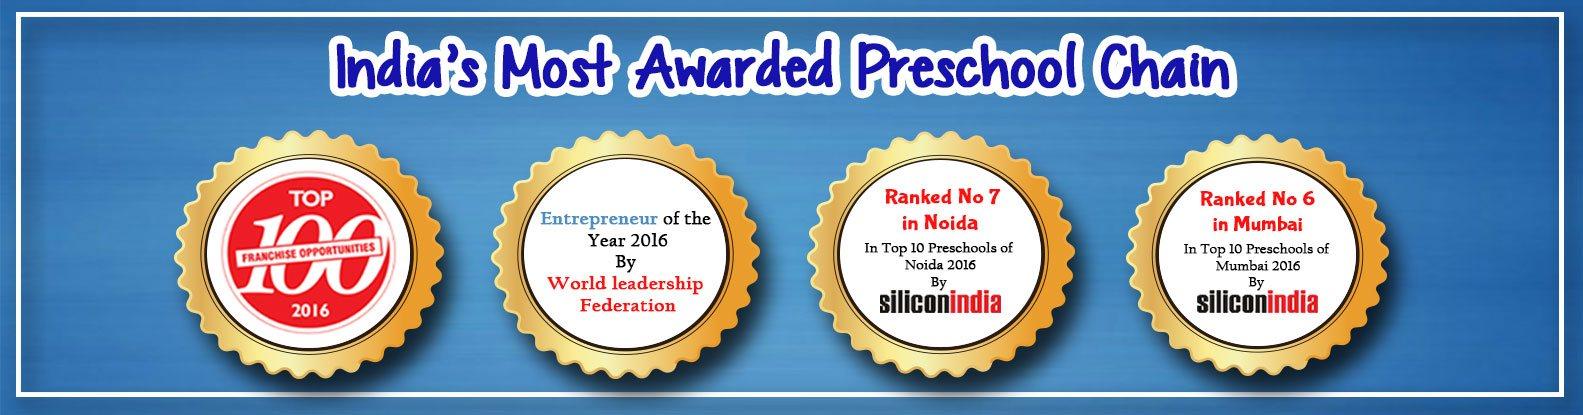 India's Most Awarded Preschool Chain